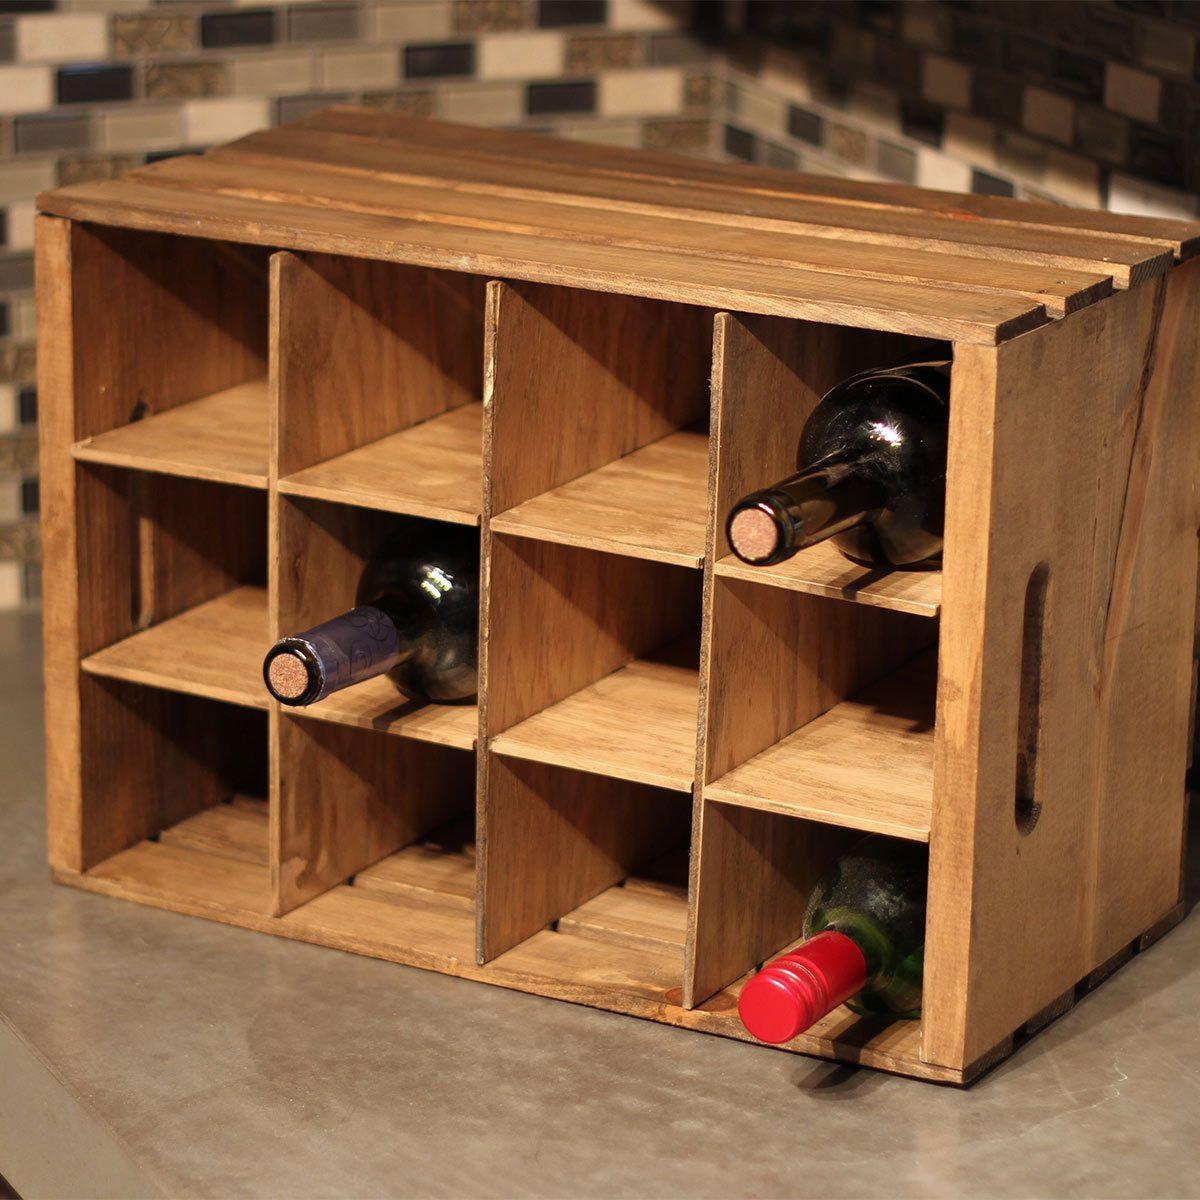 Super Simple Countertop Wine Rack Diy Family Handyman